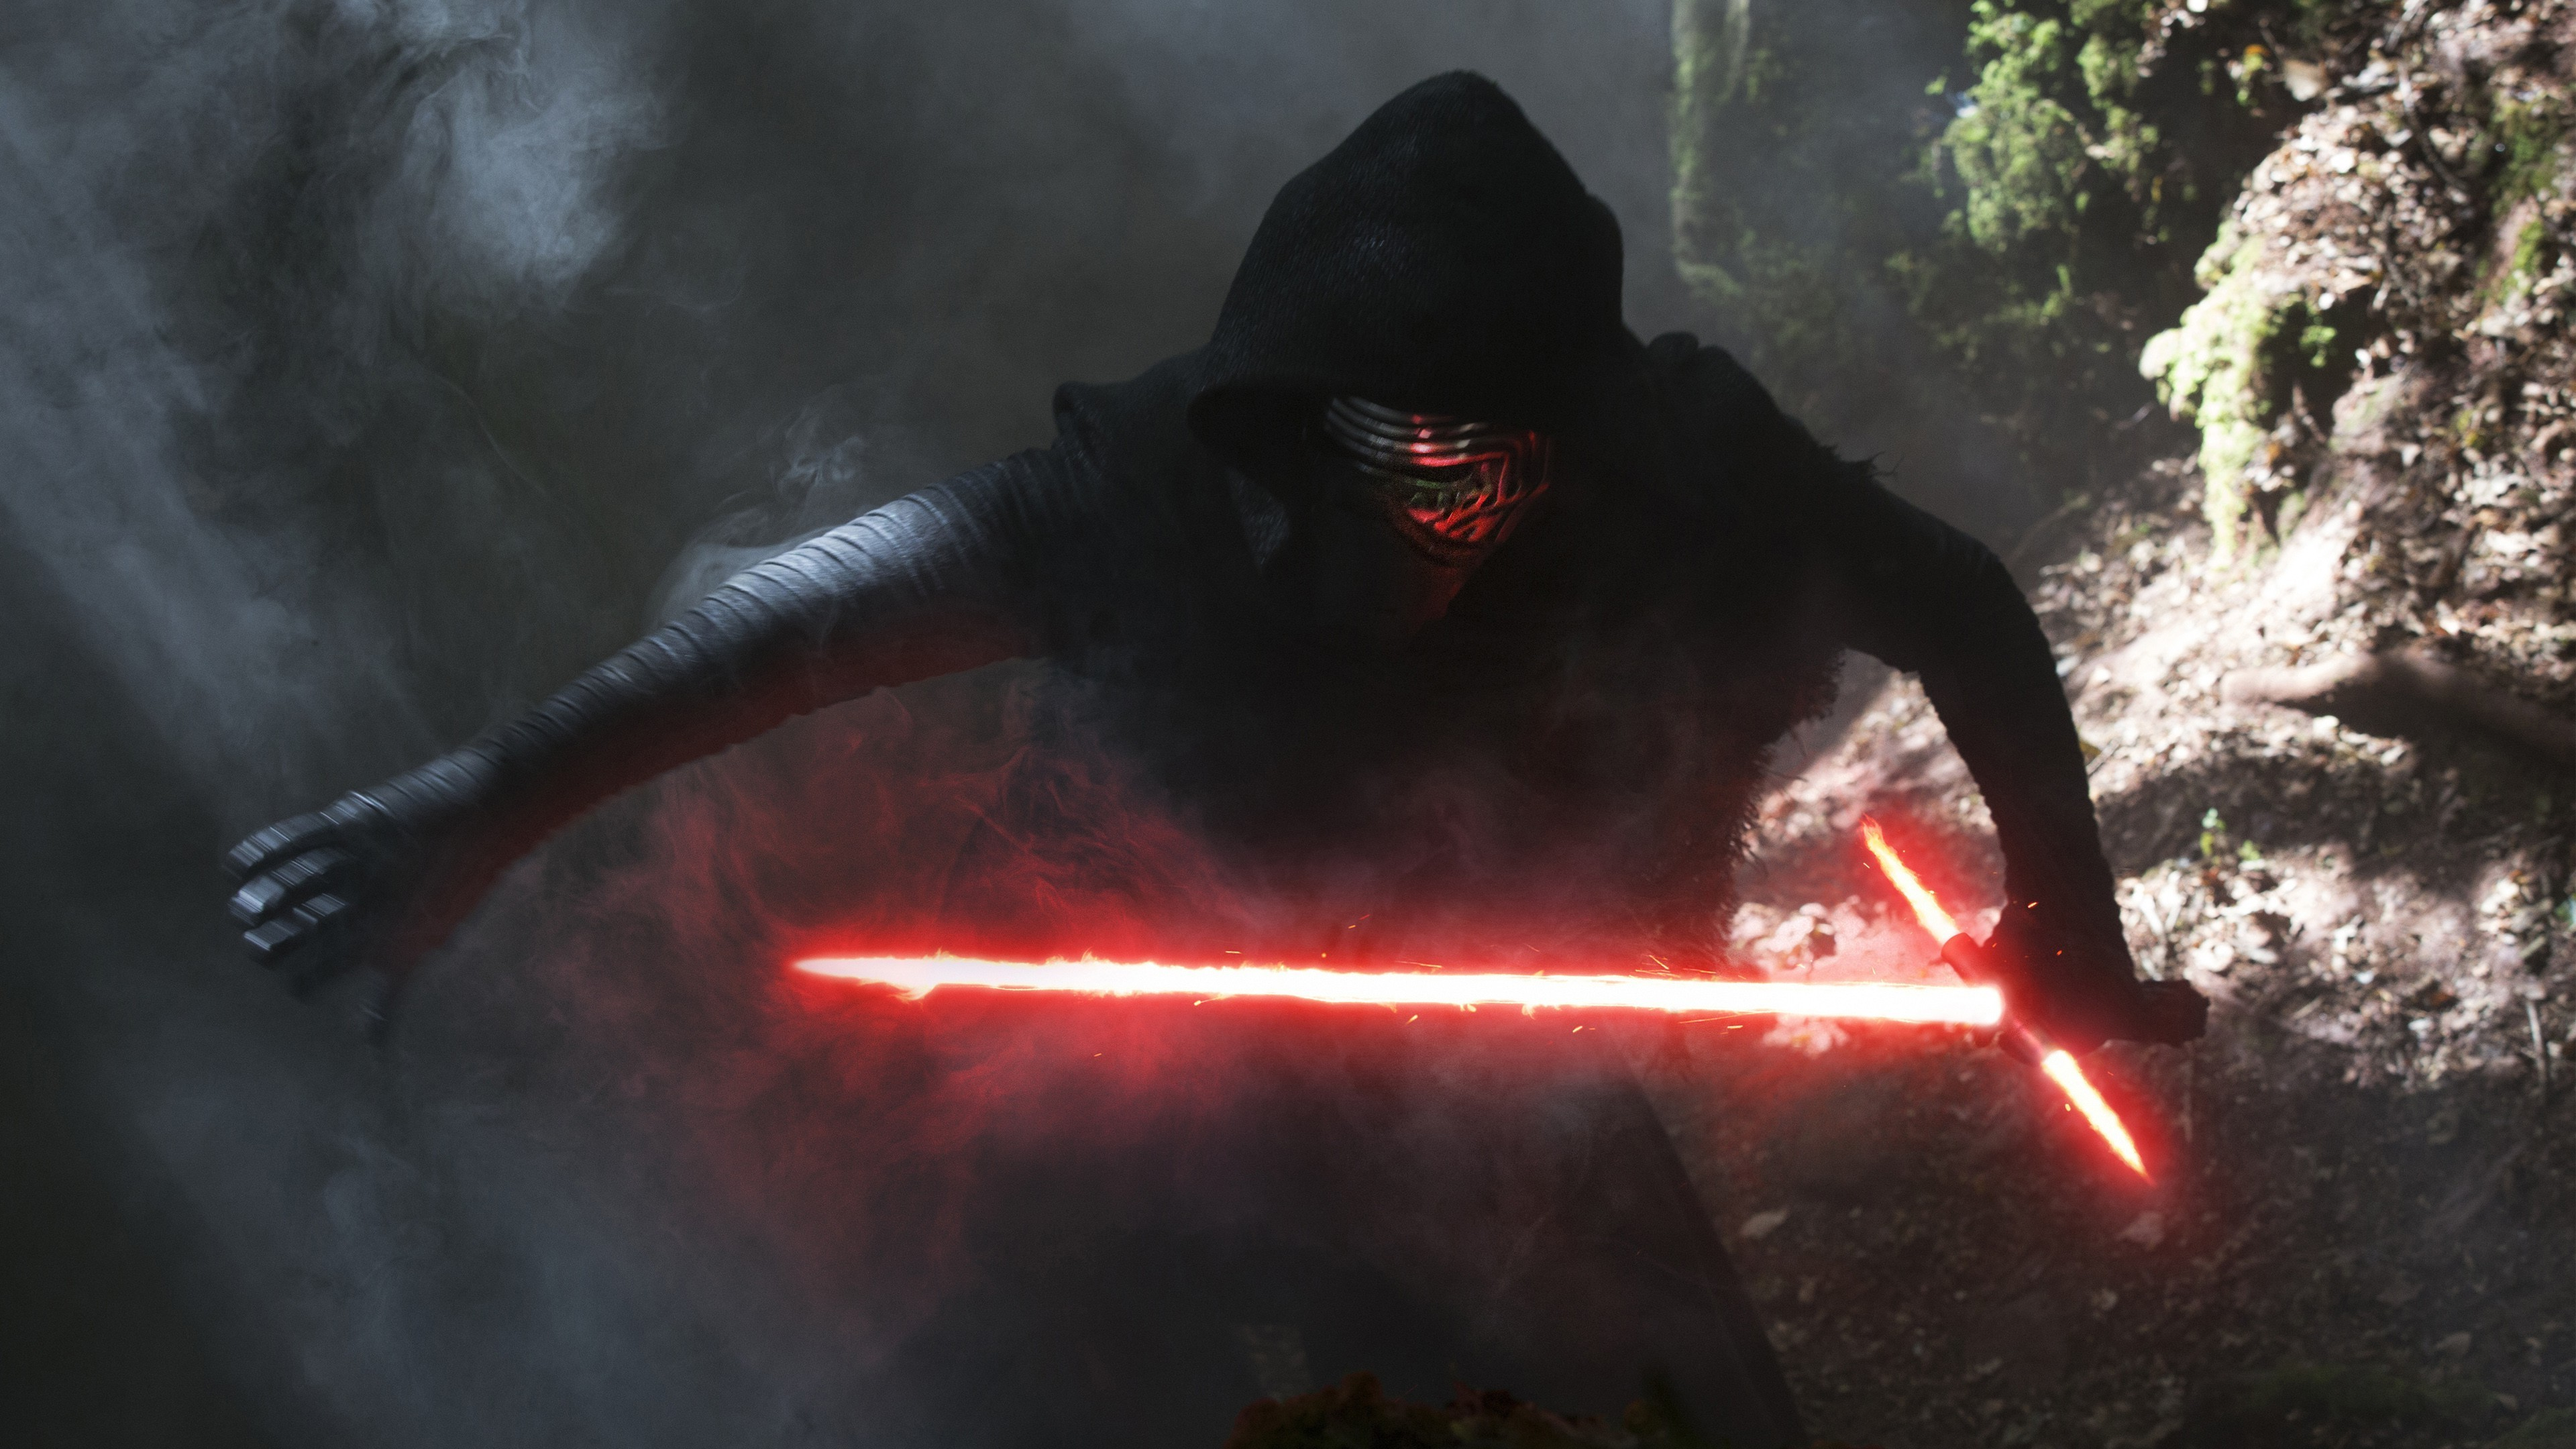 Kylo Ren, Star Wars: The Force Awakens, Lightsaber Wallpapers HD / Desktop  and Mobile Backgrounds